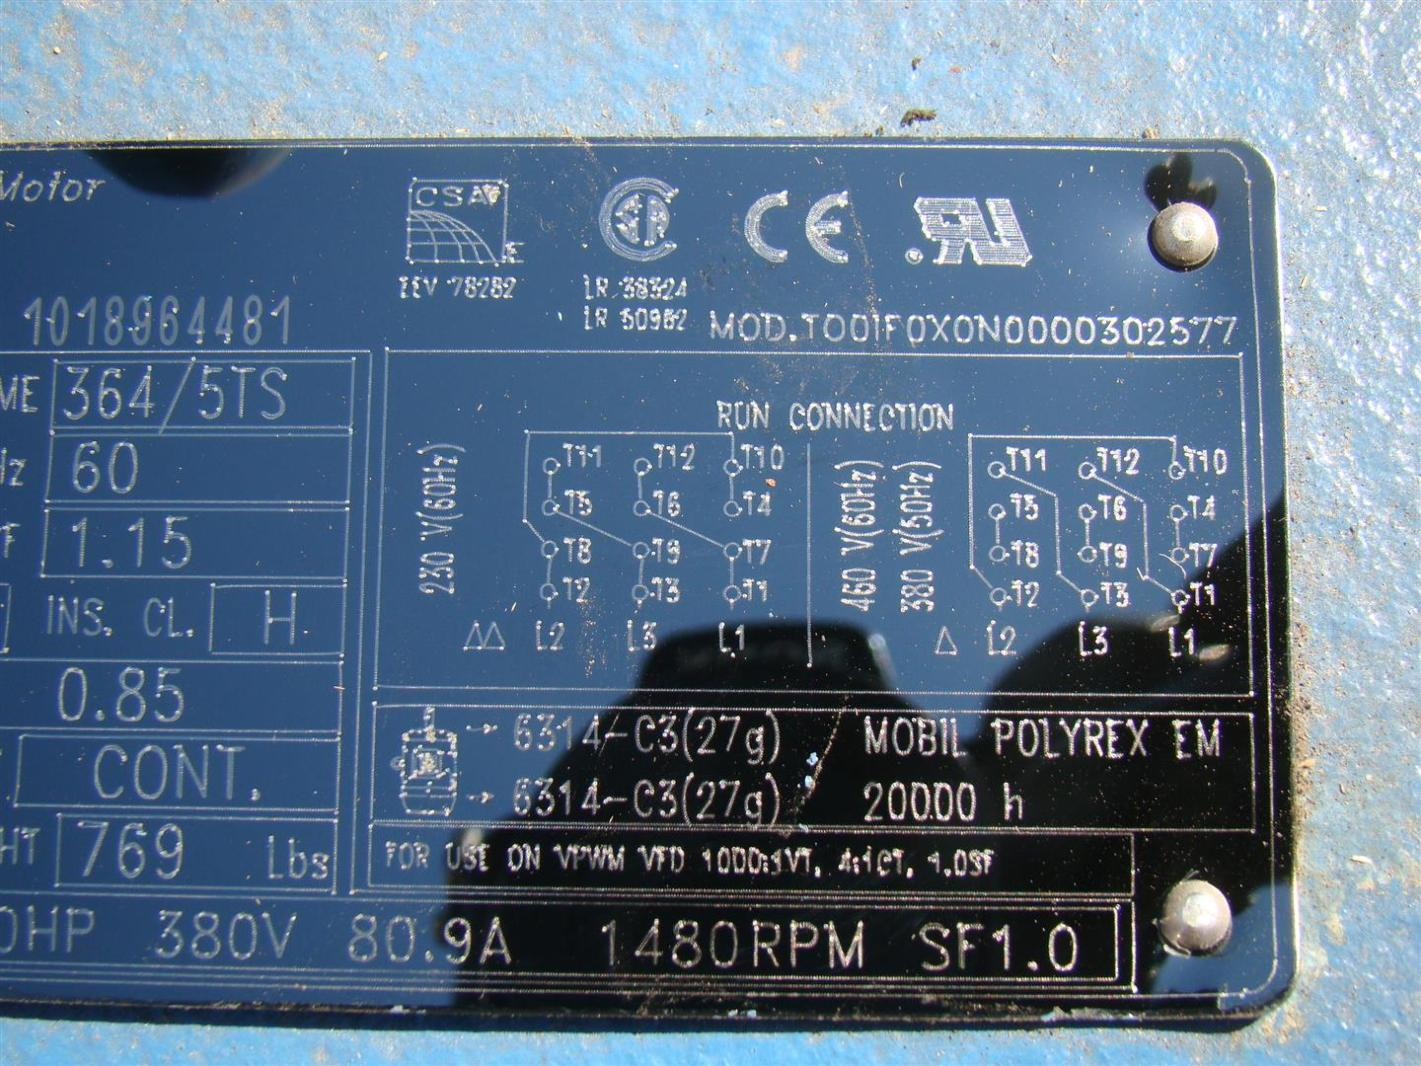 WEG 3 Phase Electric Motor 60 HP 1780 RPM 230/460V Model ...